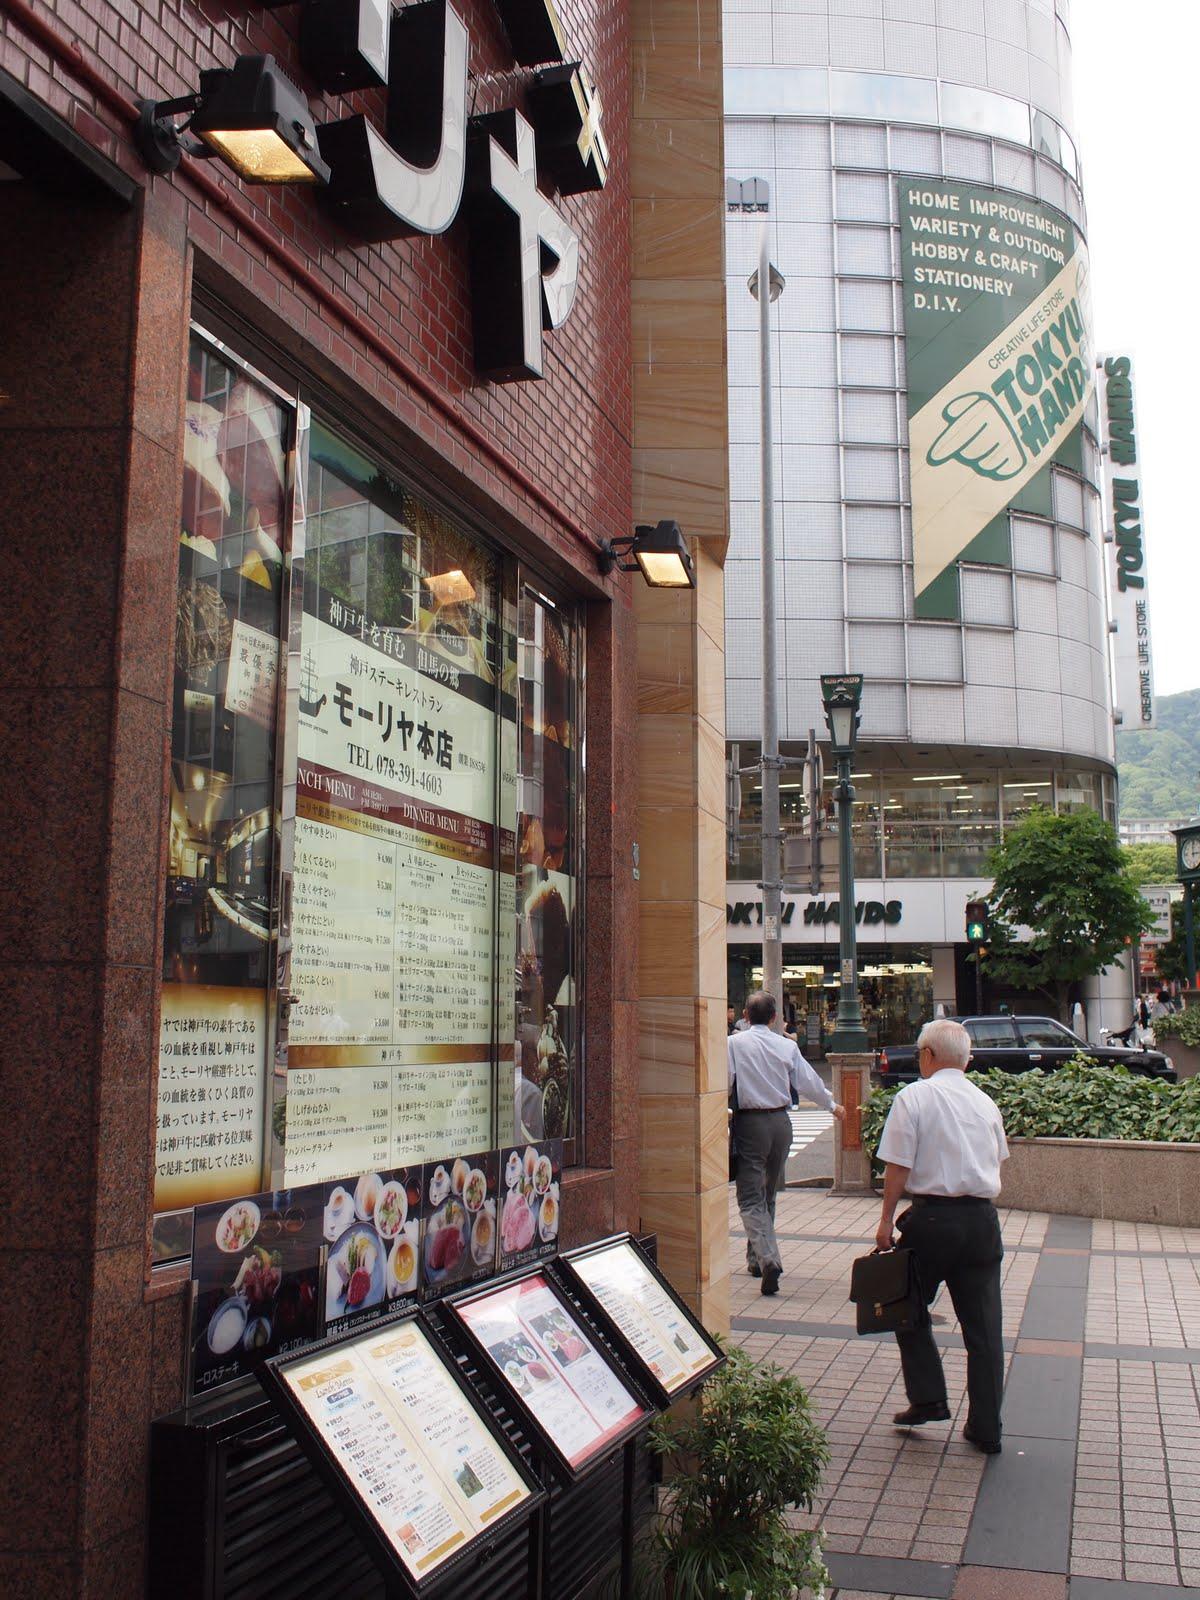 Japan June 2011 - Day 2 - Kobe | p0nderosa